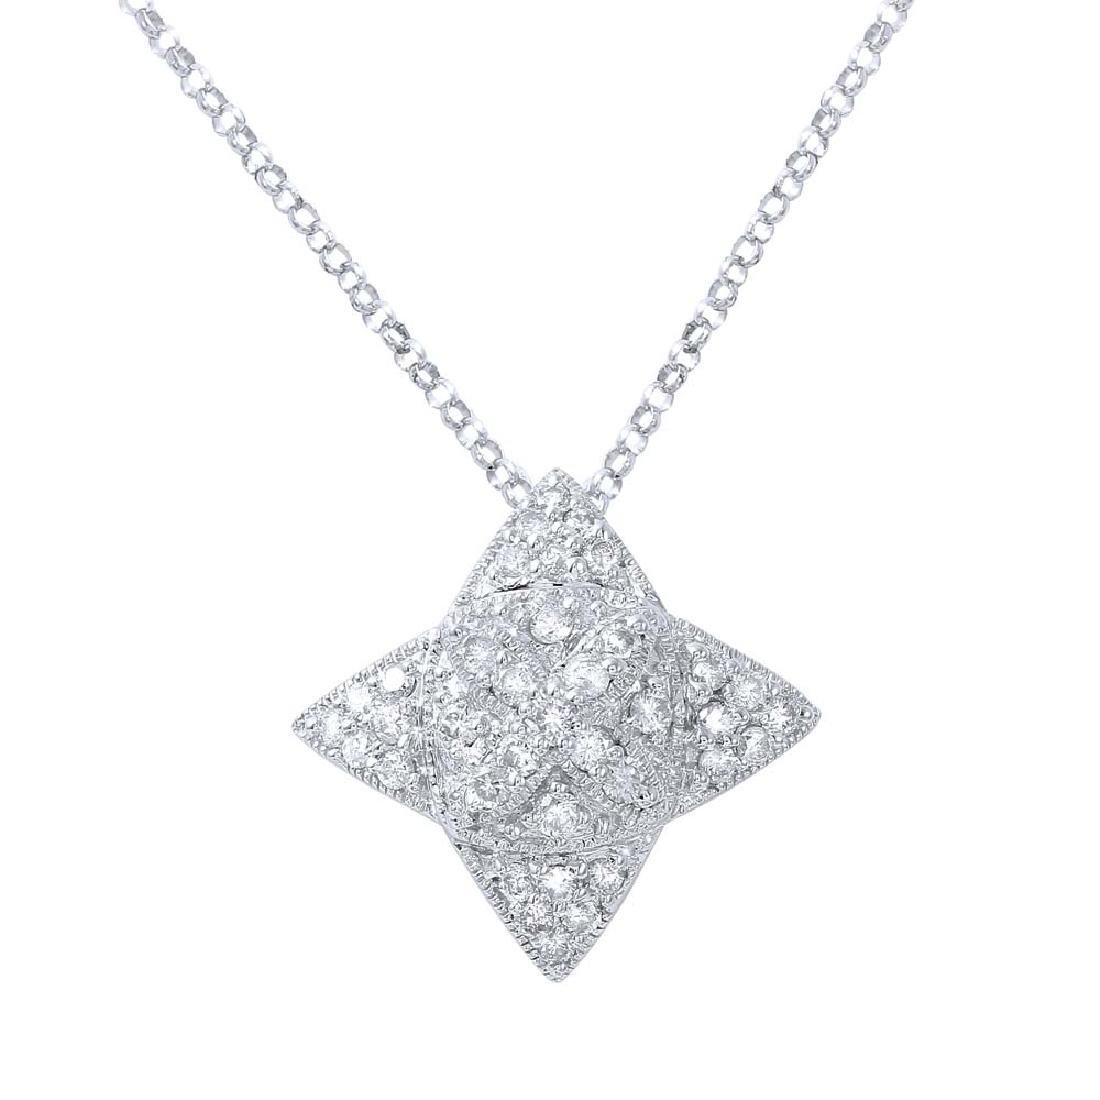 Genuine 0.68 TCW 18K White Gold Ladies Necklace